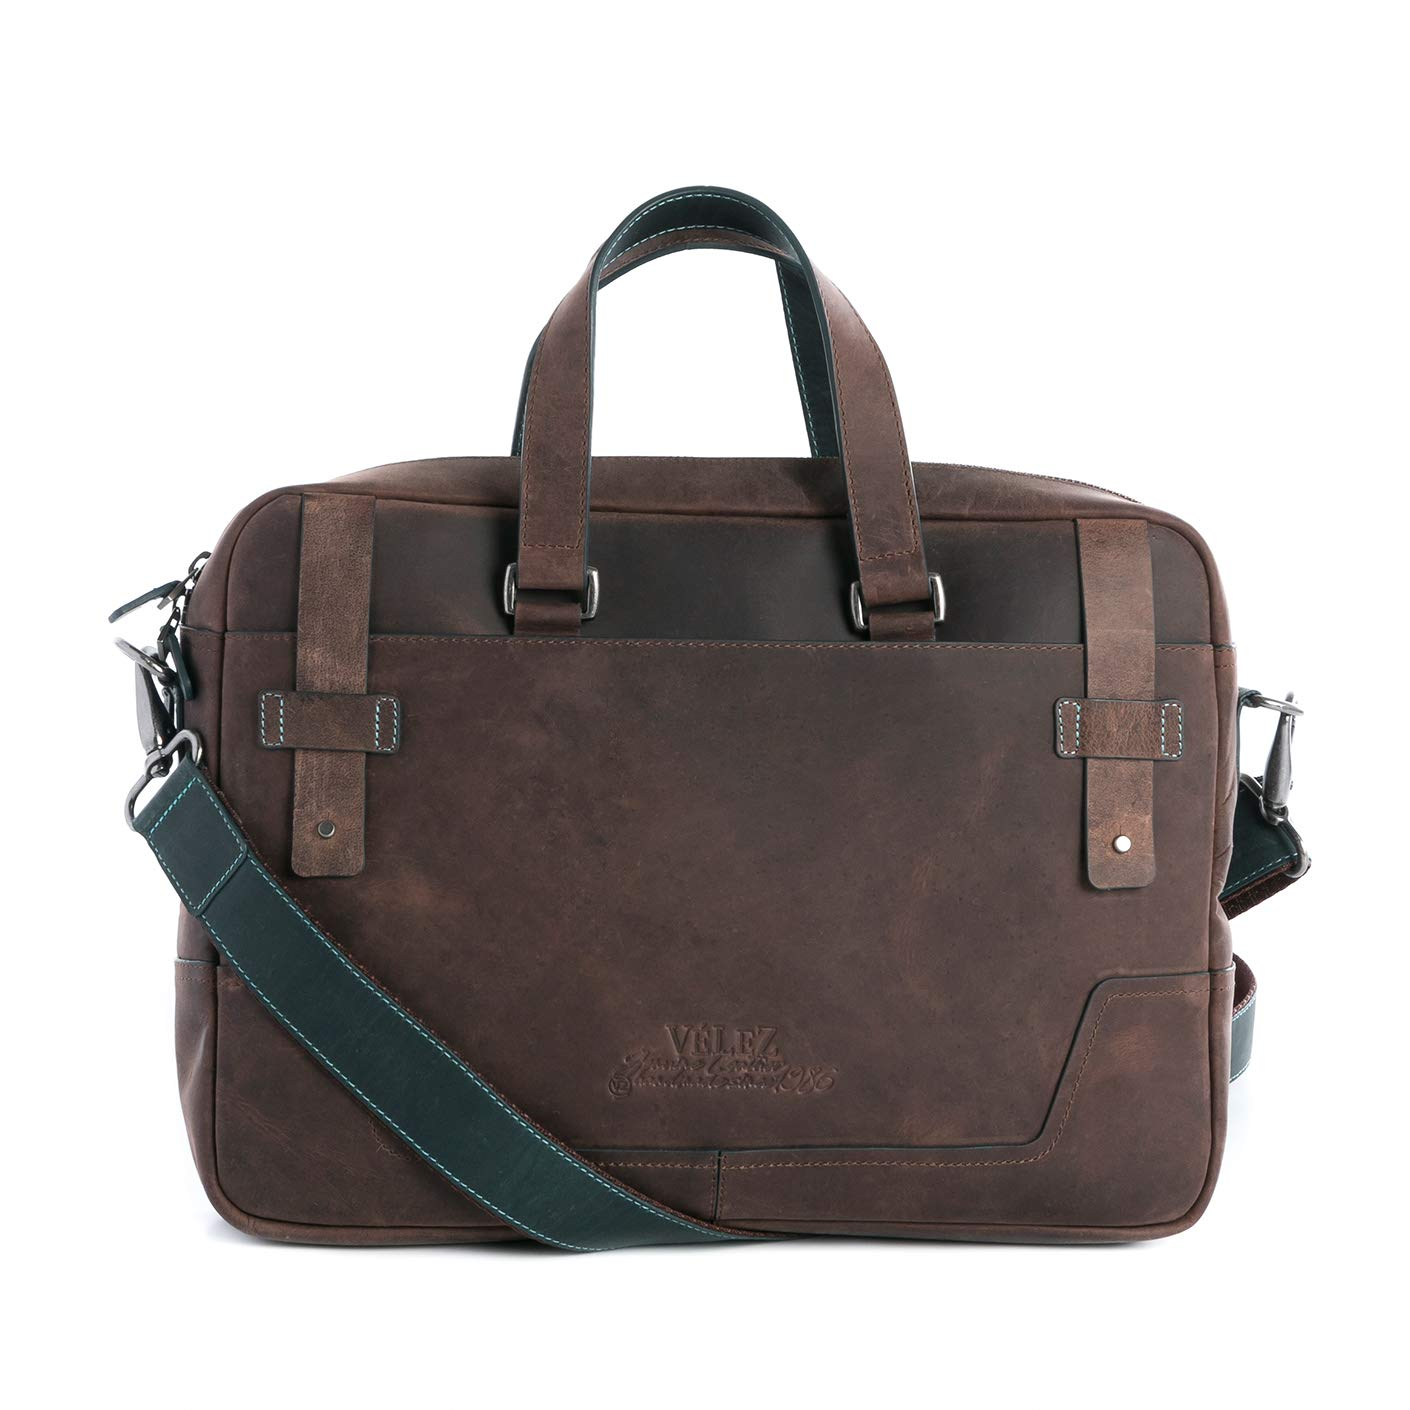 ... Genuine Colombian Leather Business Travel Briefcase Laptop Crossbody Messenger Bag | Maletin y Bolso de Cuero Colombiano para Hombres Black | Briefcases